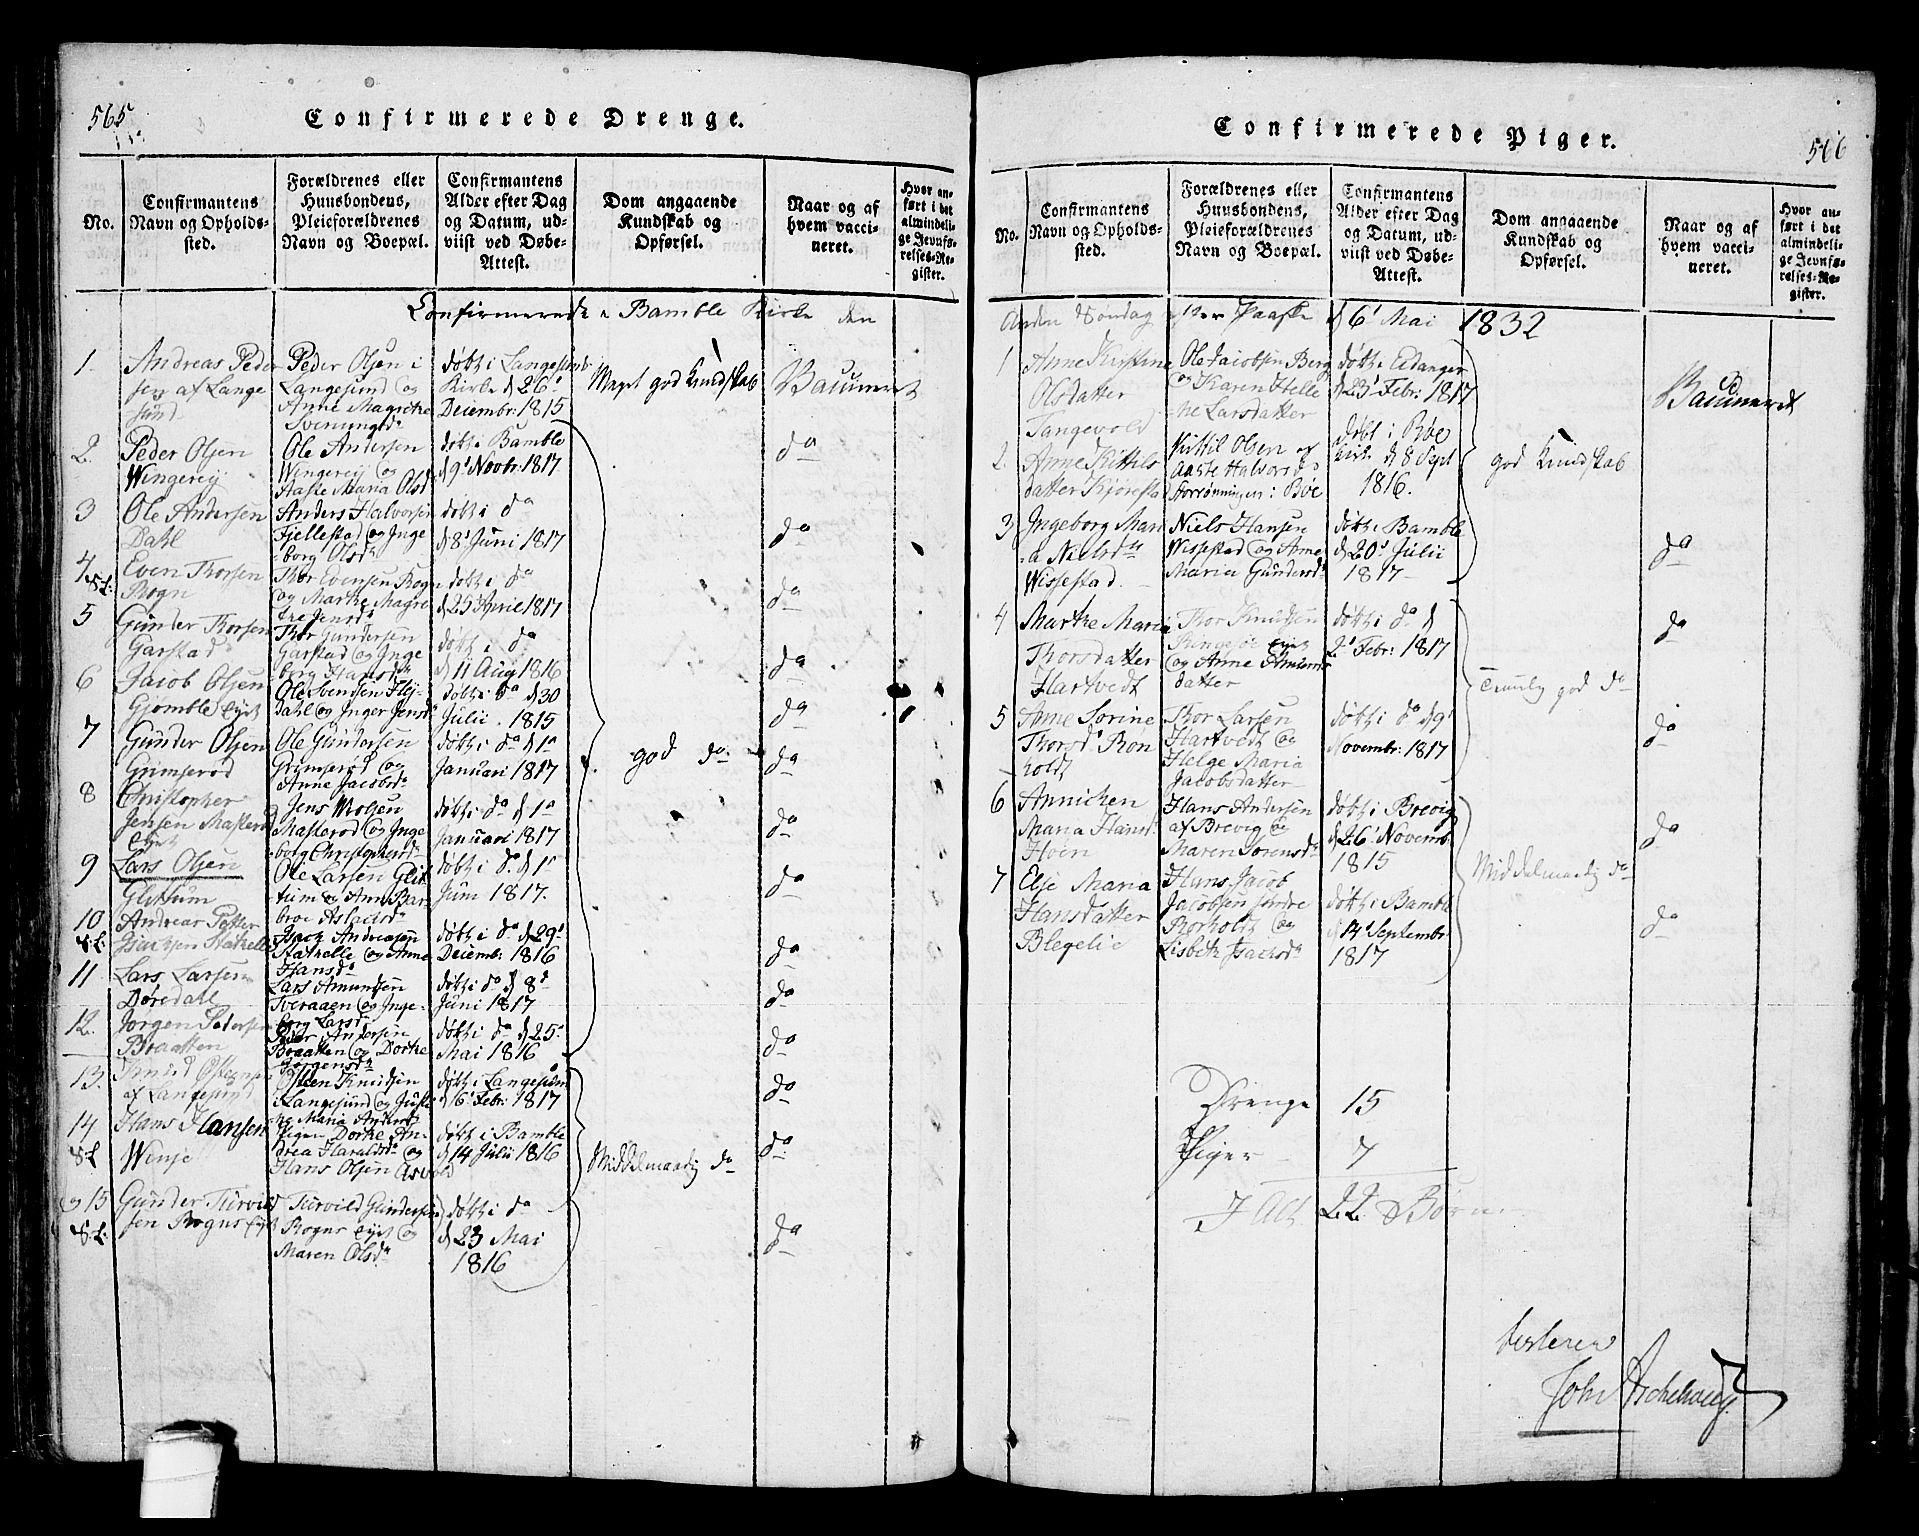 SAKO, Bamble kirkebøker, F/Fa/L0003: Ministerialbok nr. I 3 /1, 1814-1834, s. 565-566